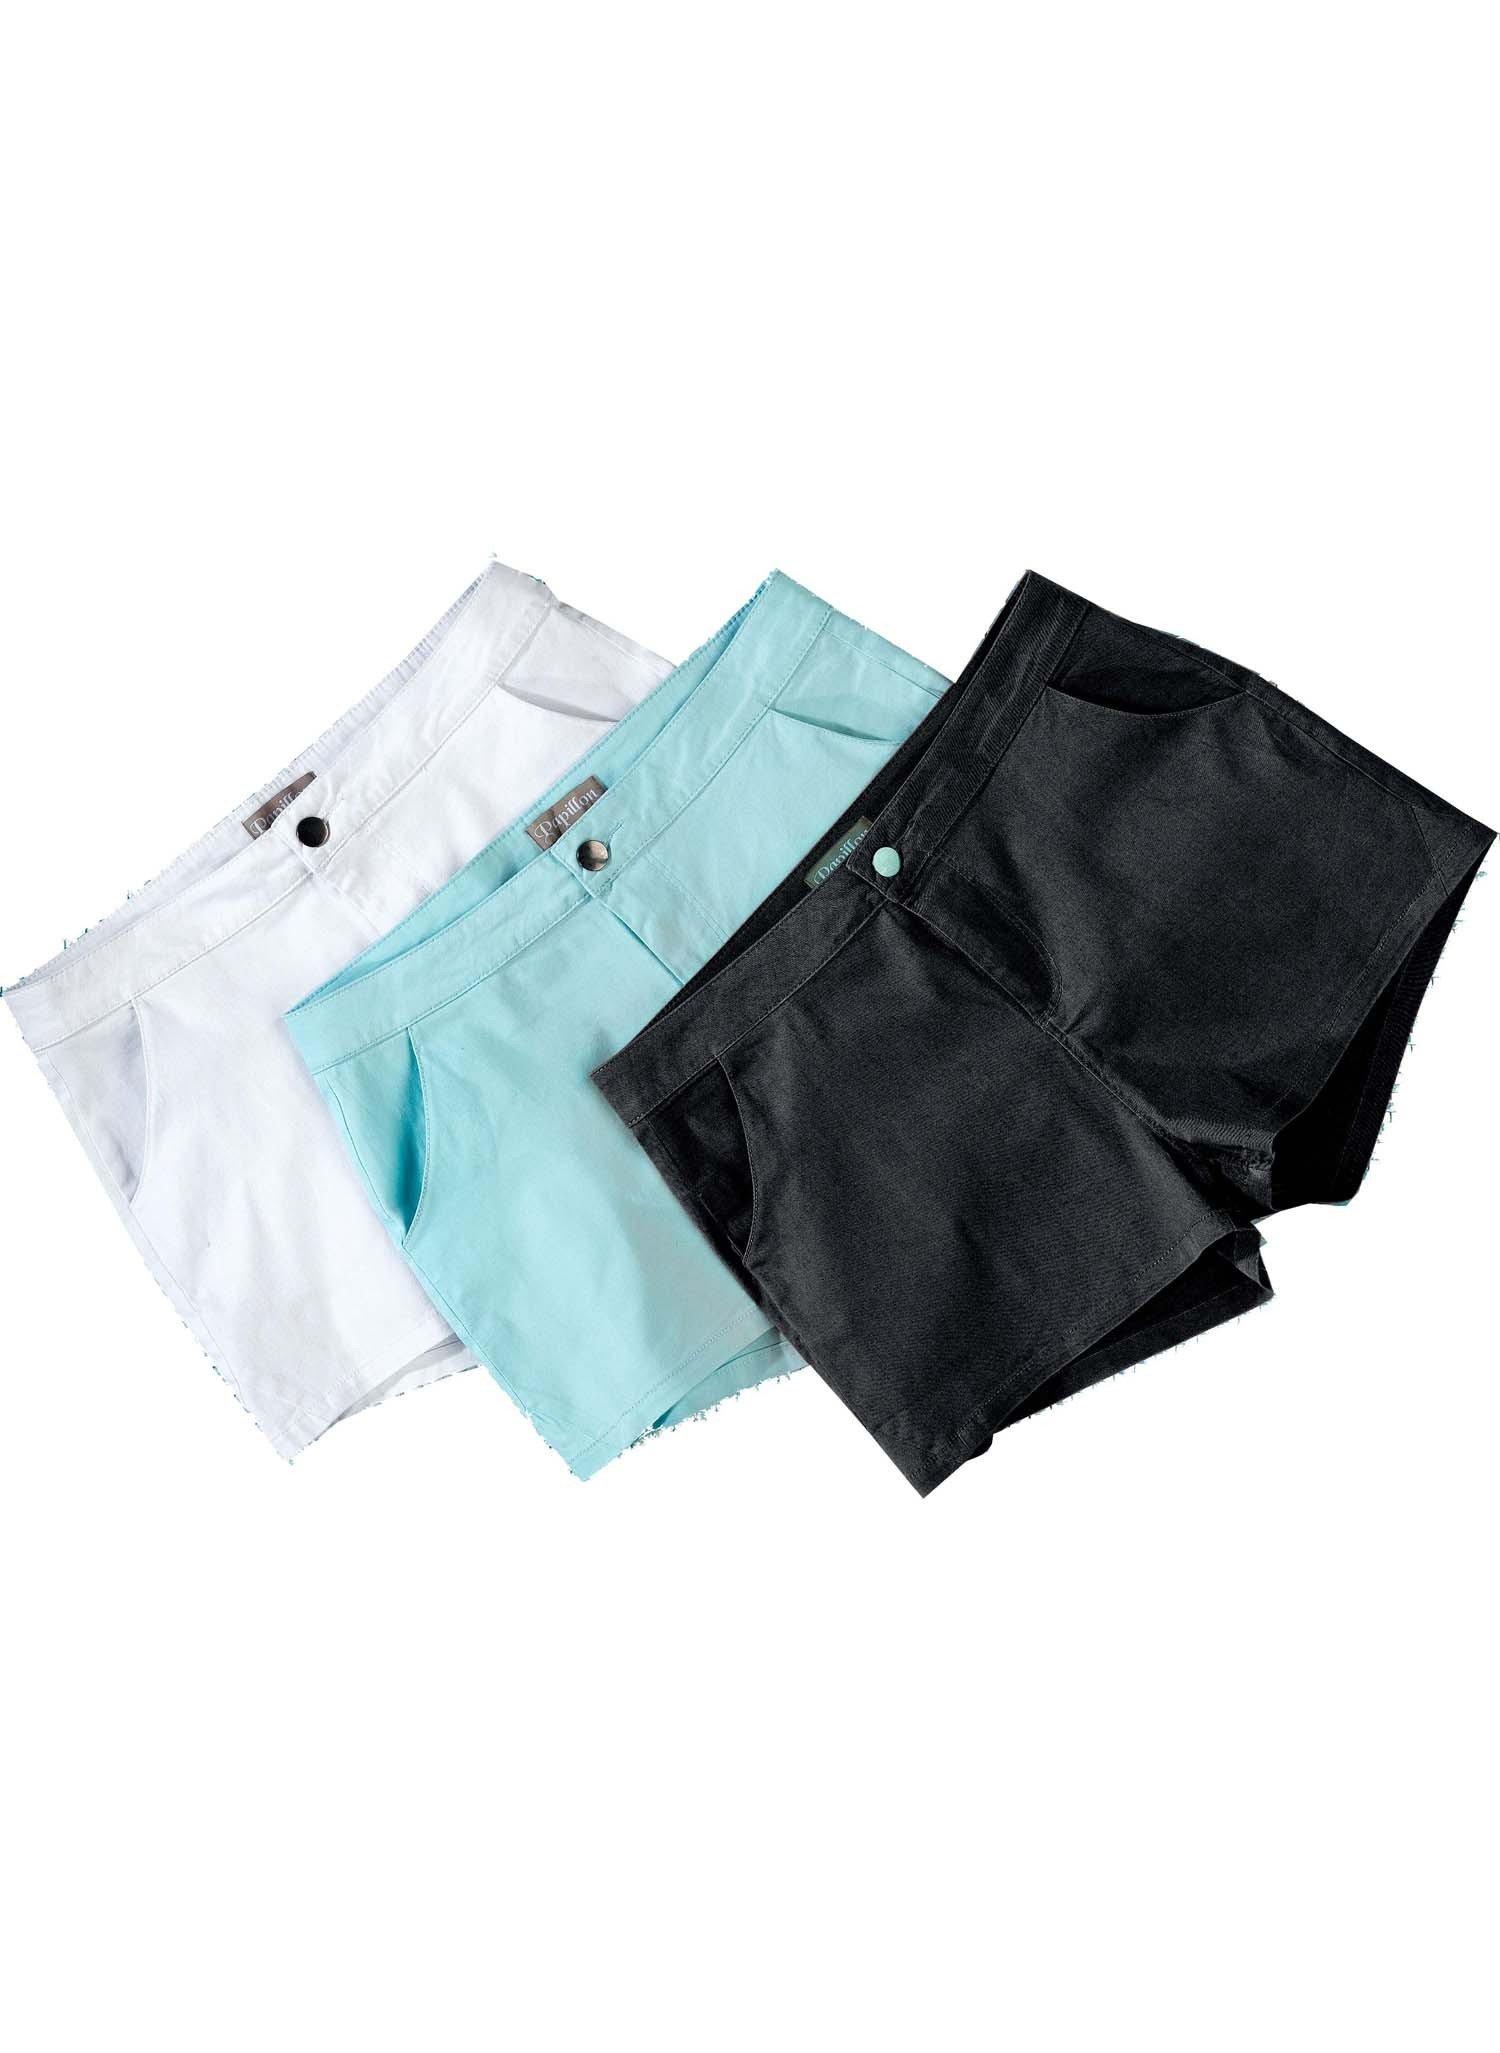 D-Shorts-Stretch schwarz L 010 - 2 - Ronja.ch